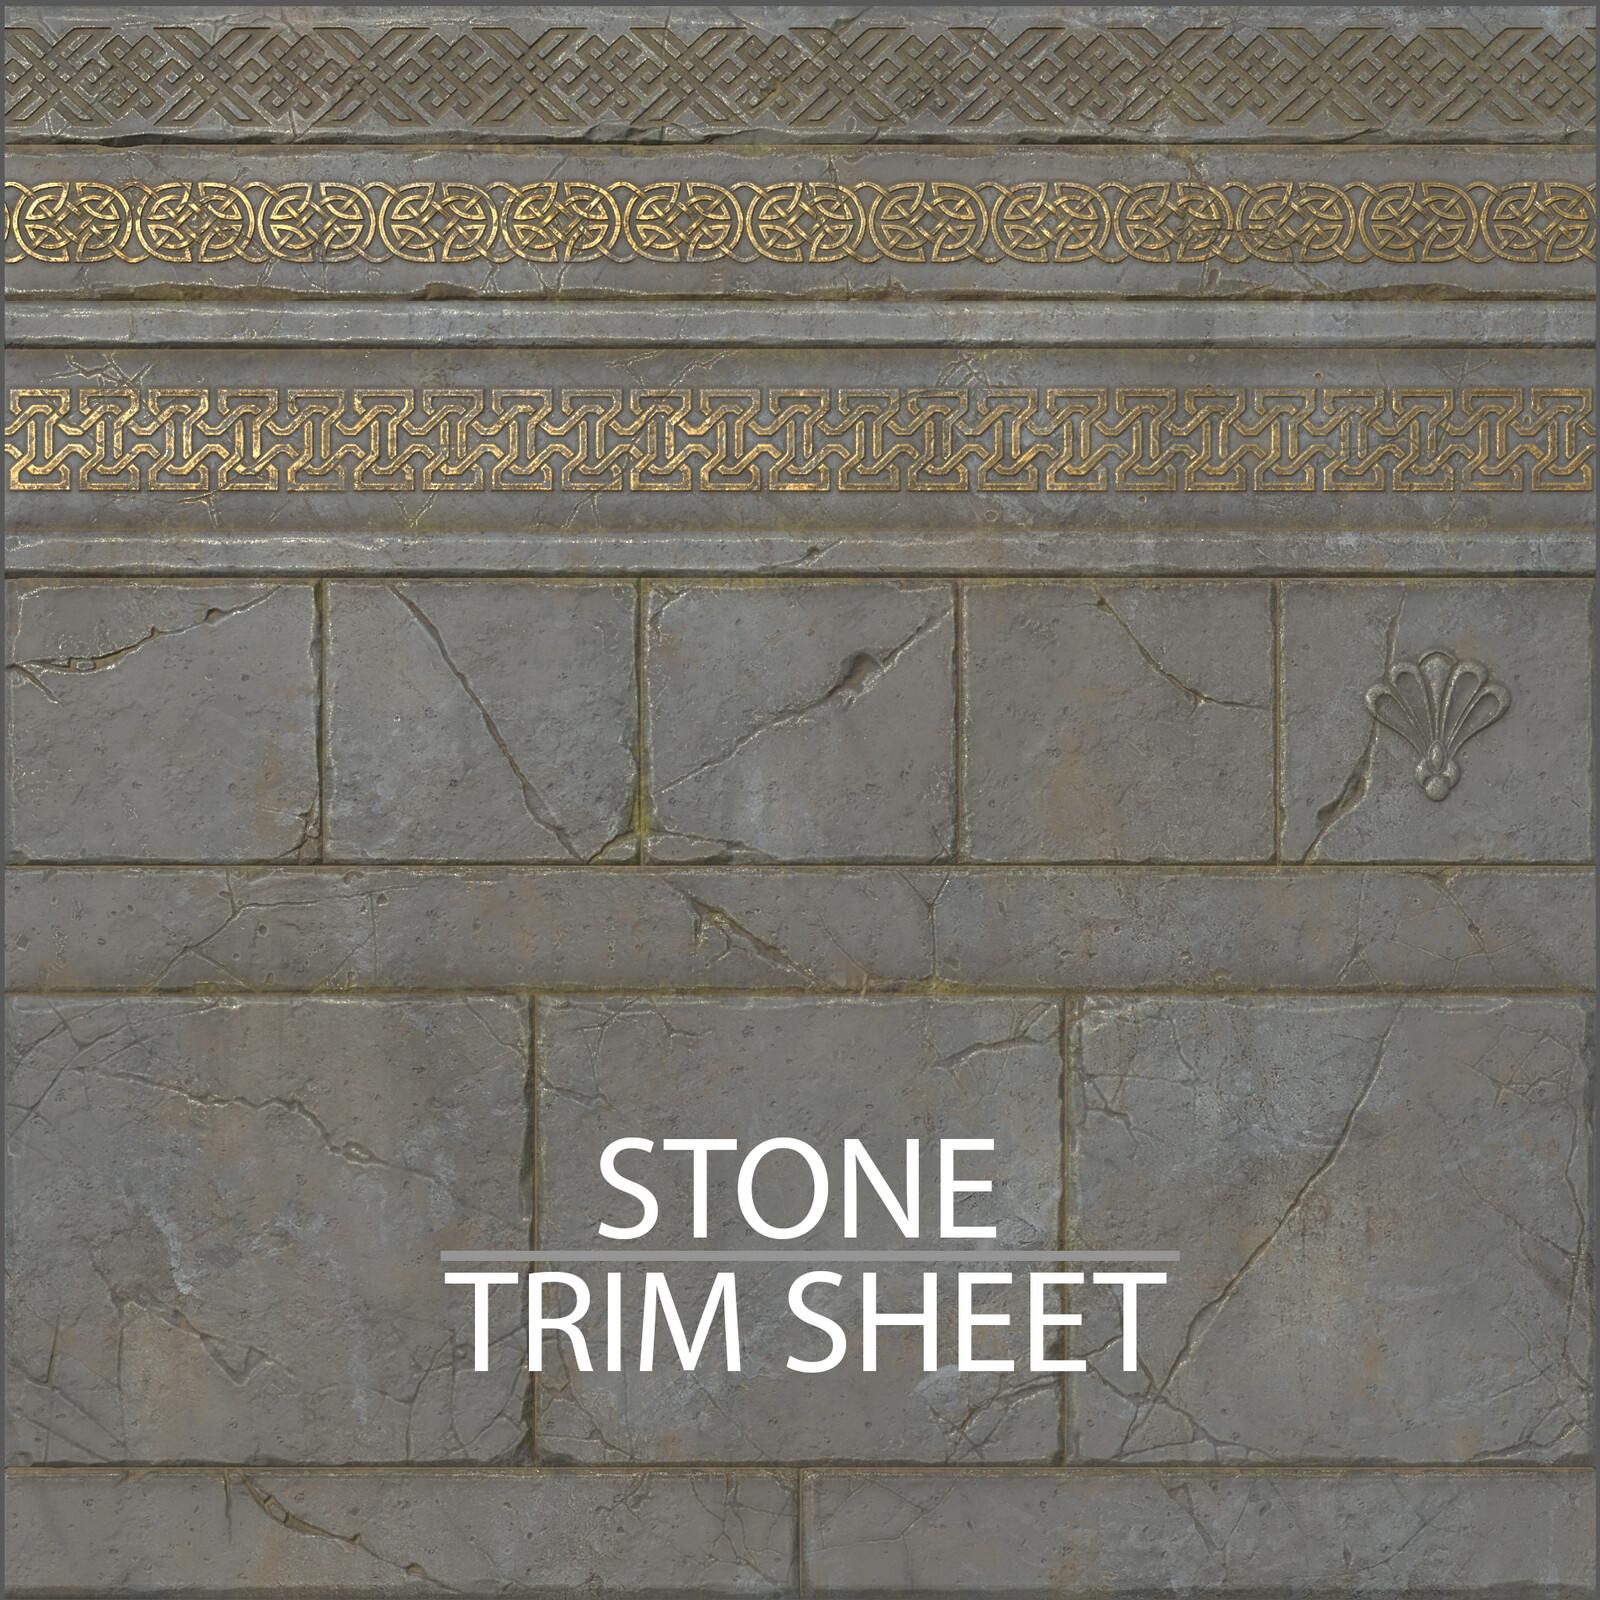 Stone Trim Sheet